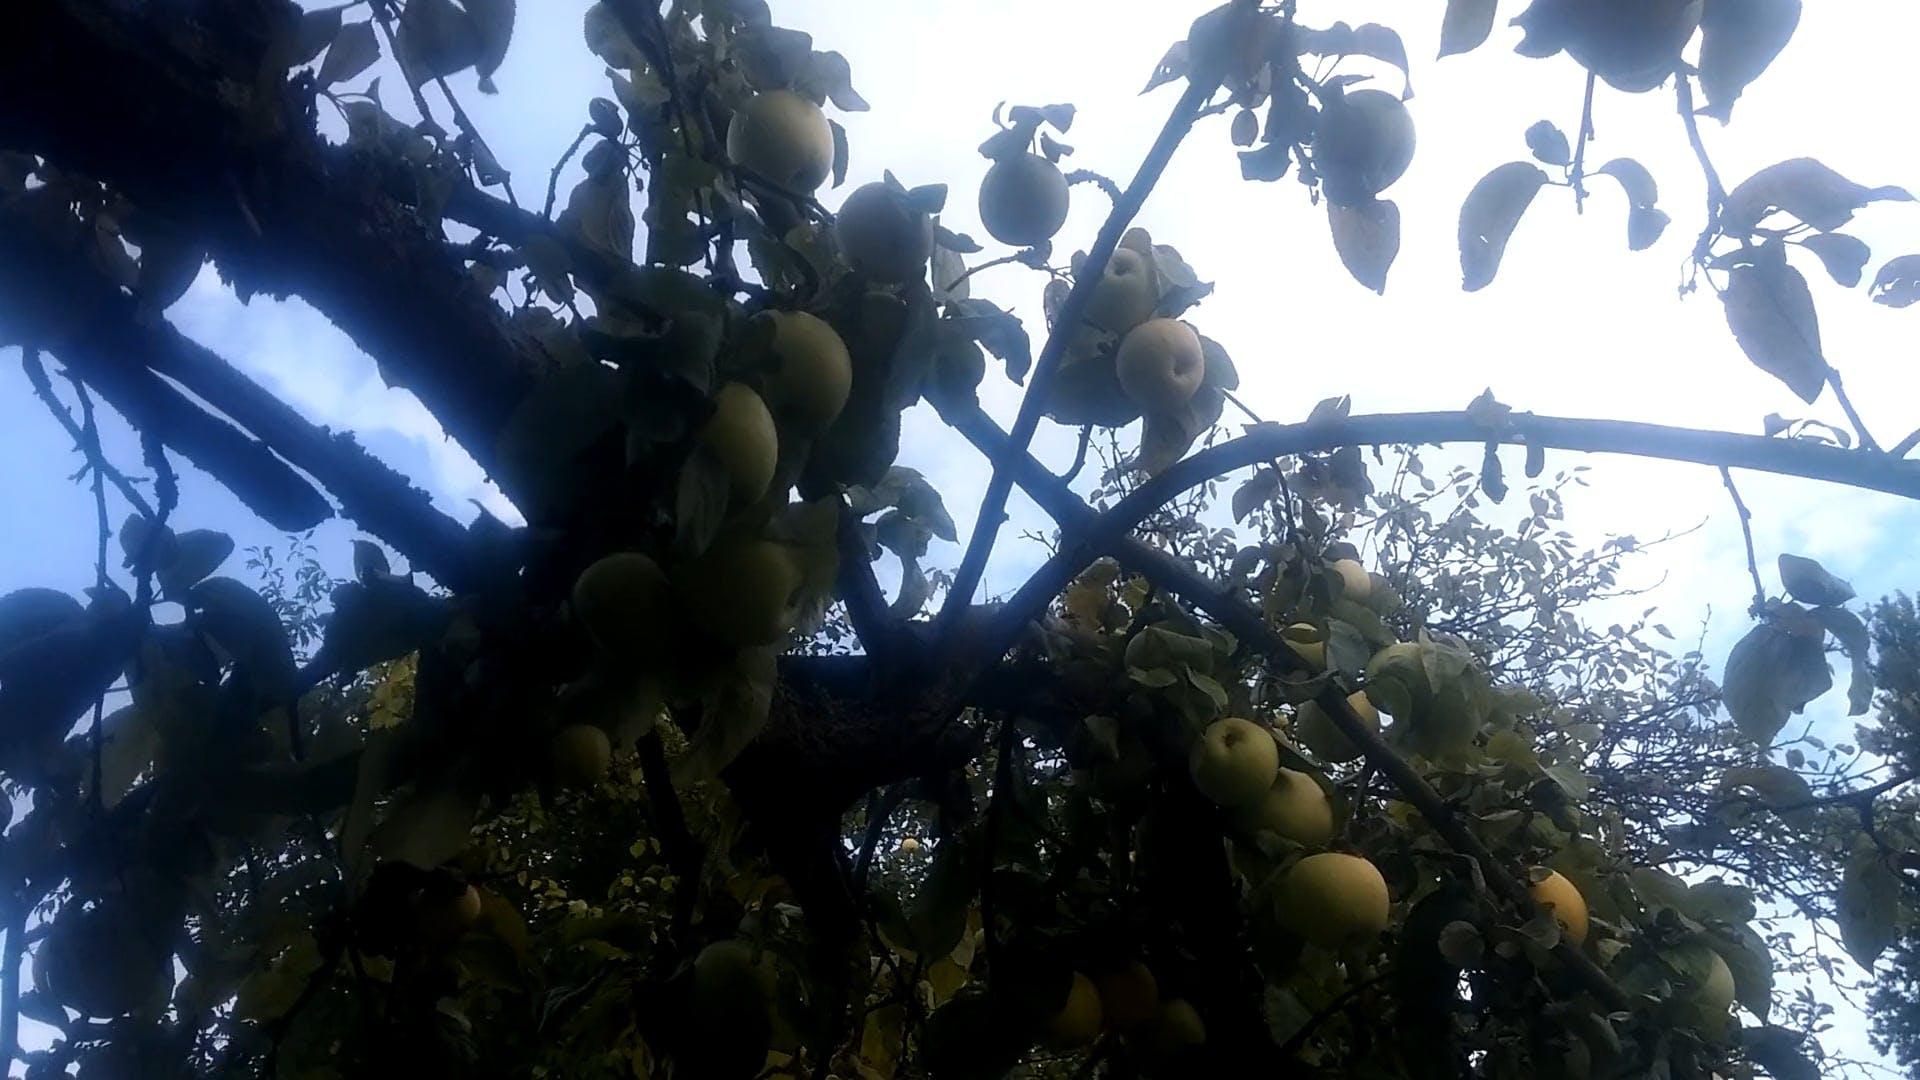 Video of Apples on Tree